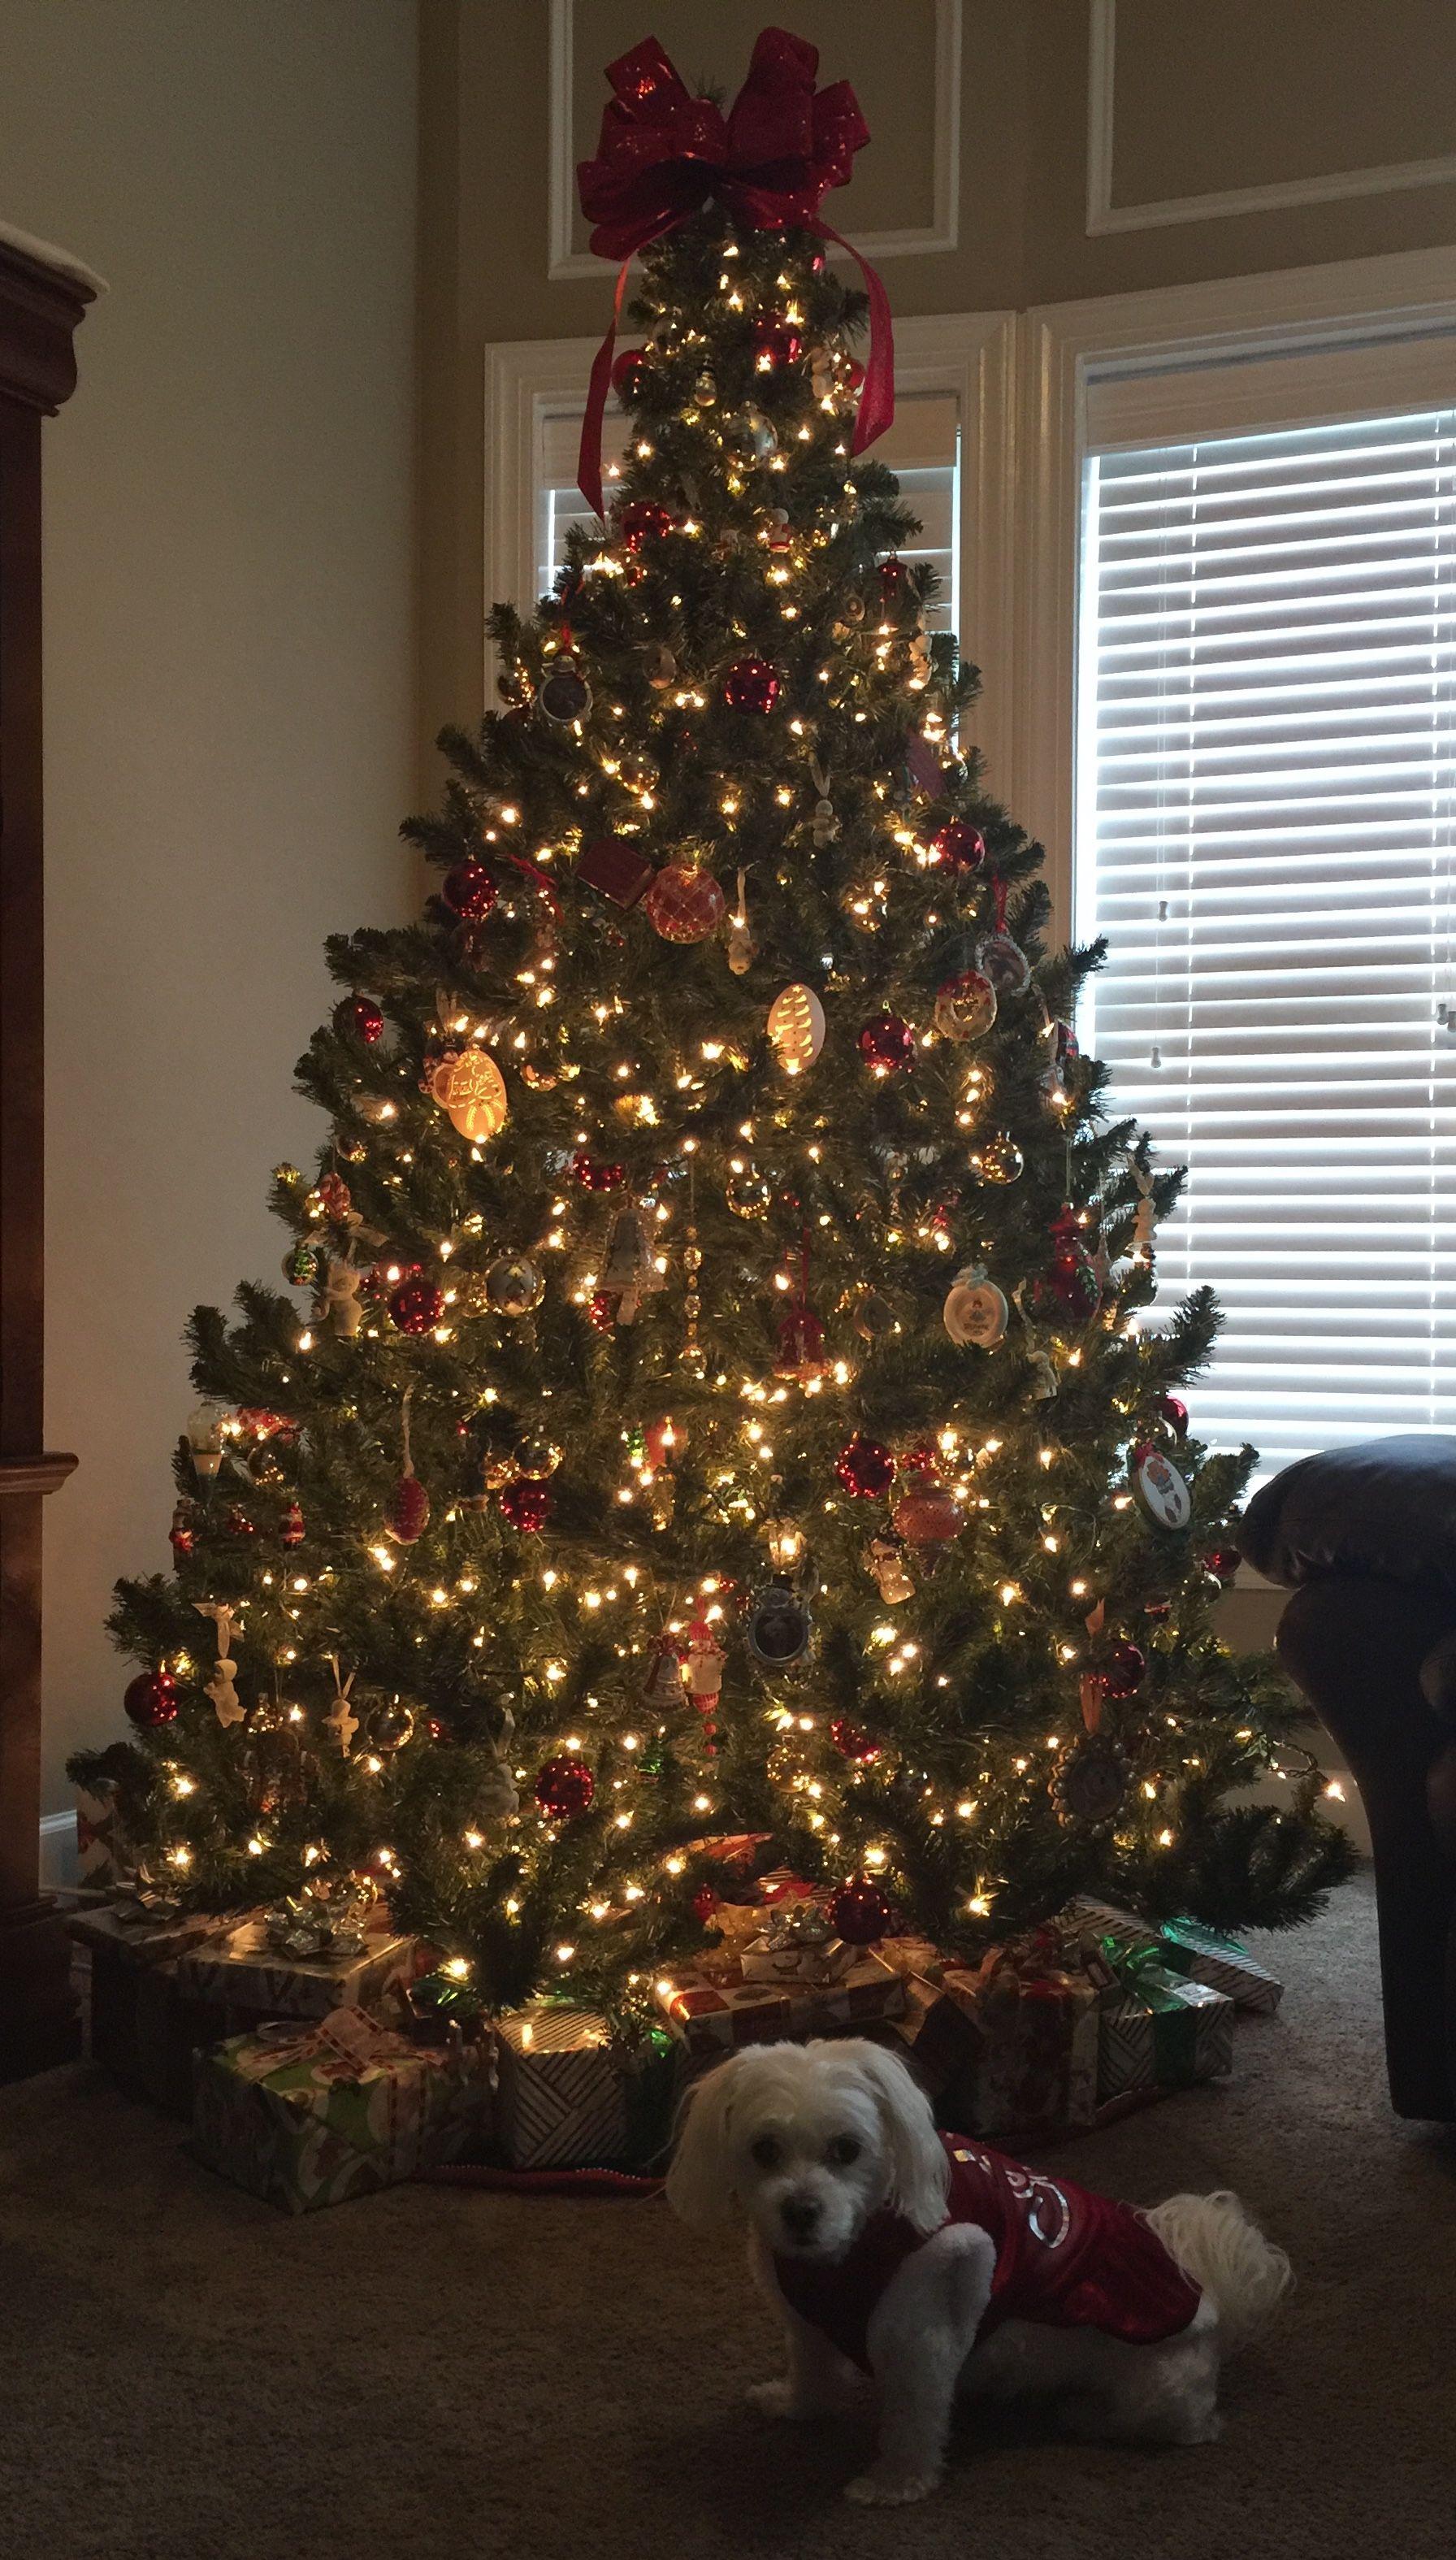 Pin by Stephanie Sandlin on Dogs | Christmas tree, Merry ...